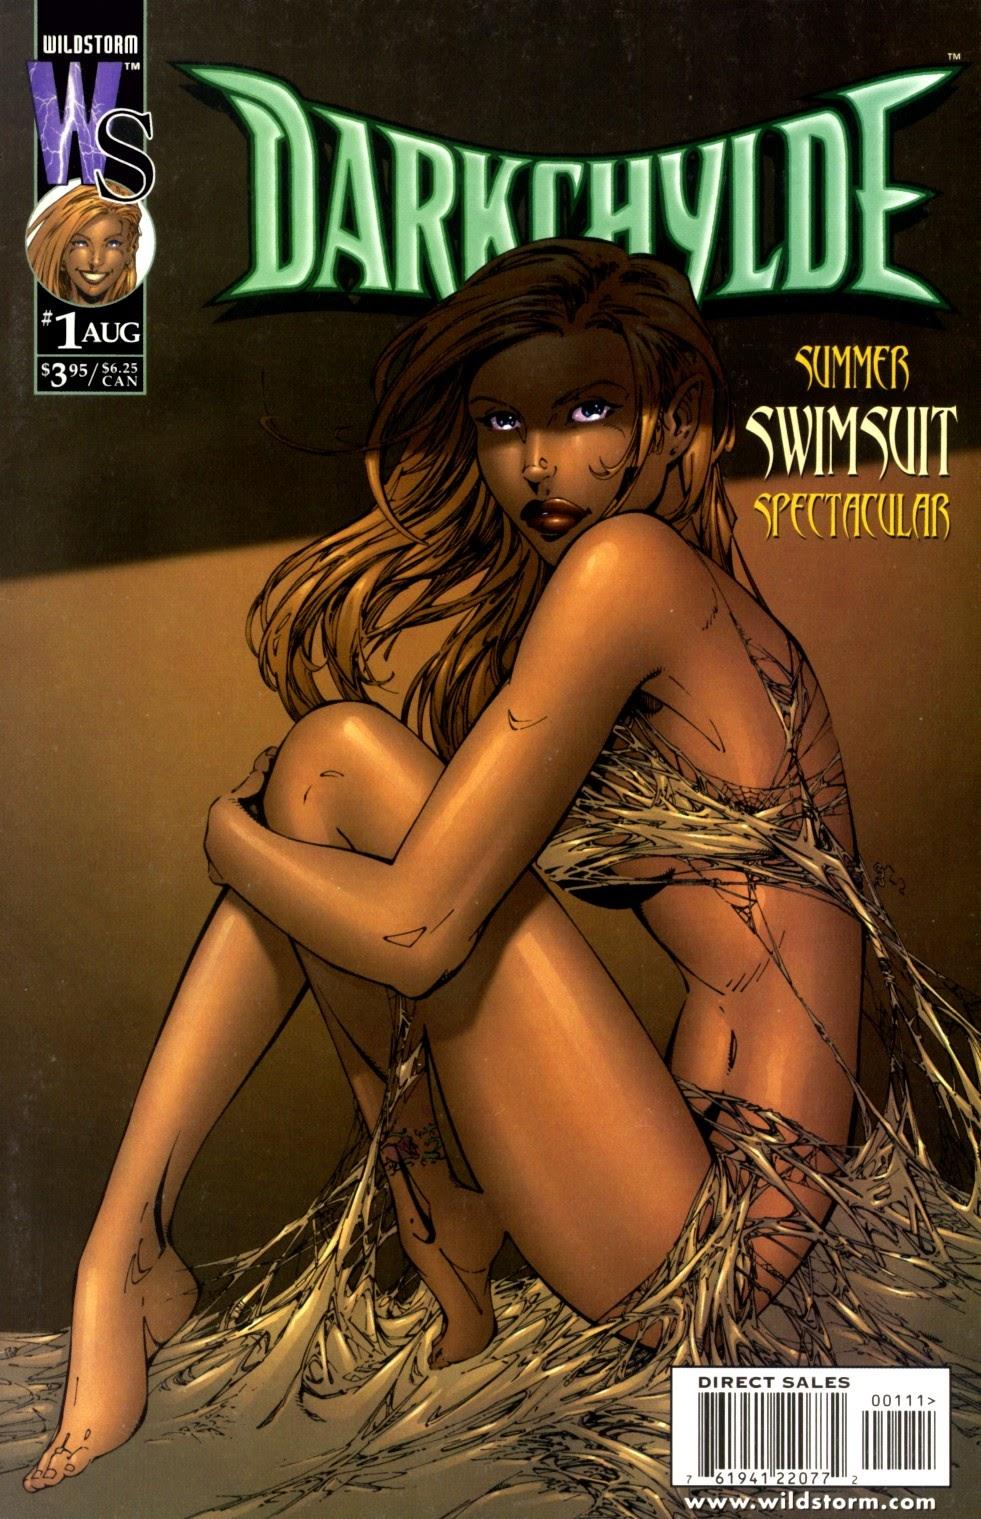 Read online Darkchylde Summer Swimsuit Spectacular comic -  Issue # Full - 1